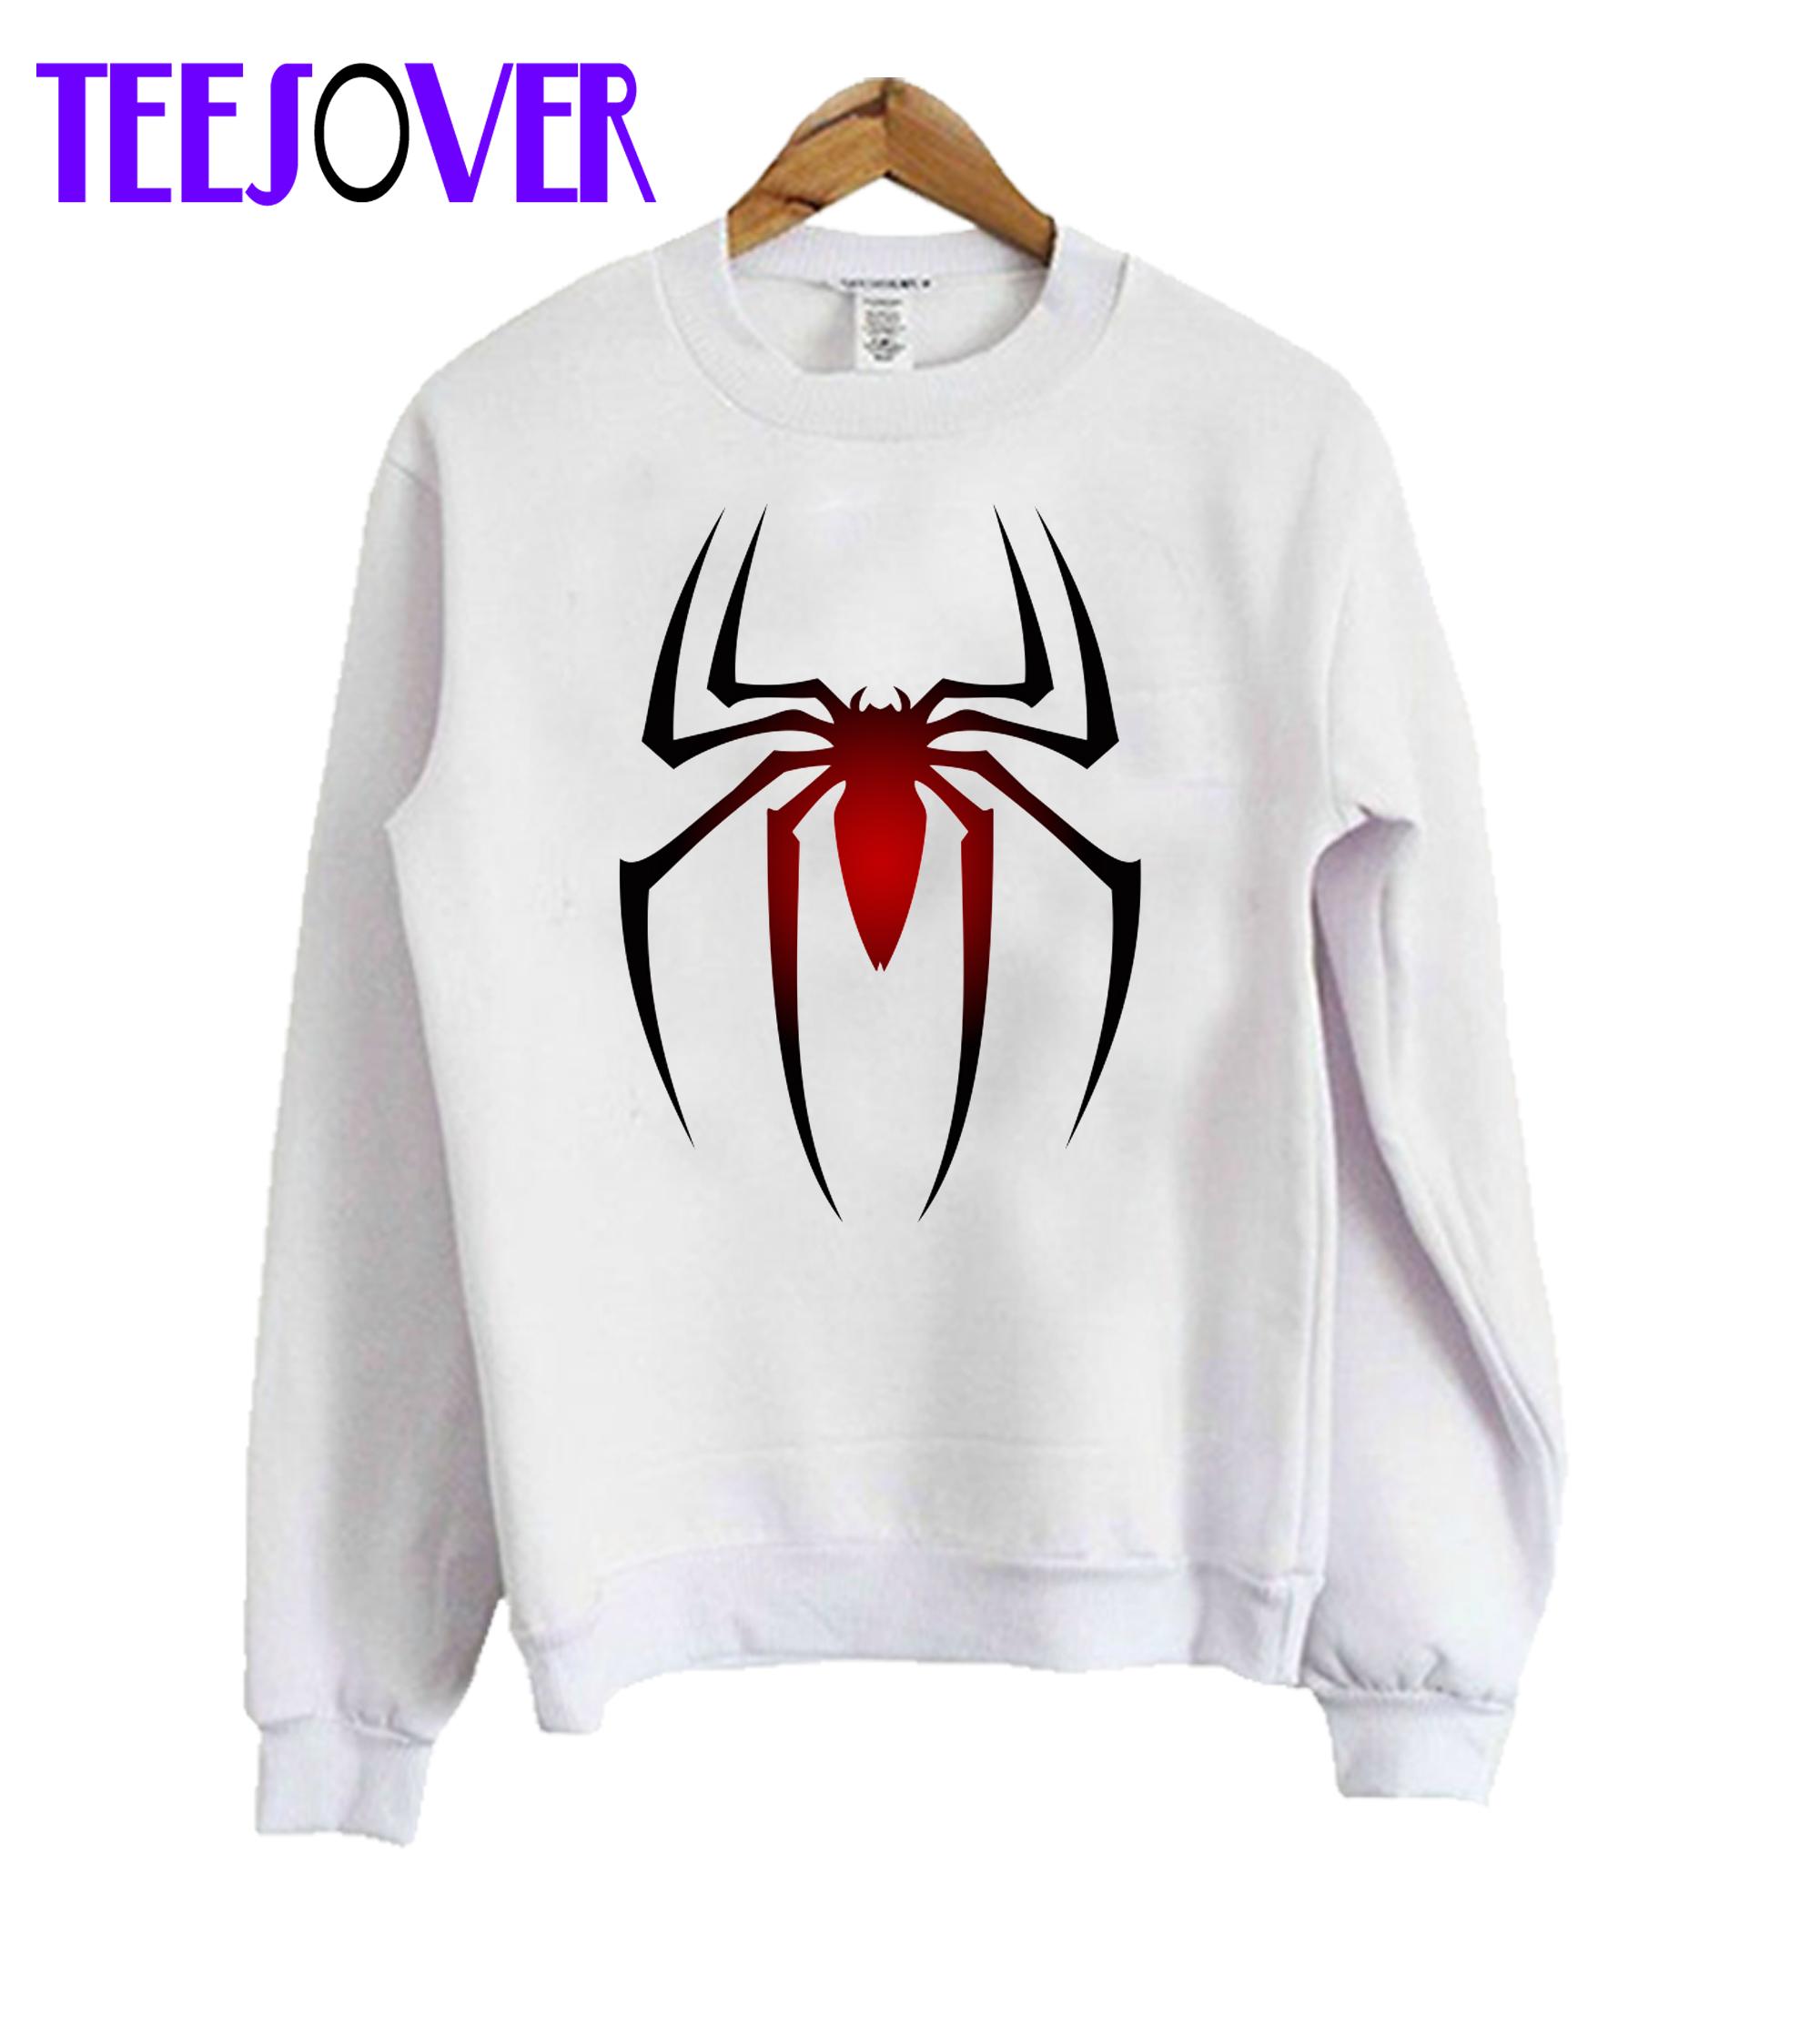 Spiderman Crewneck Sweatshirt